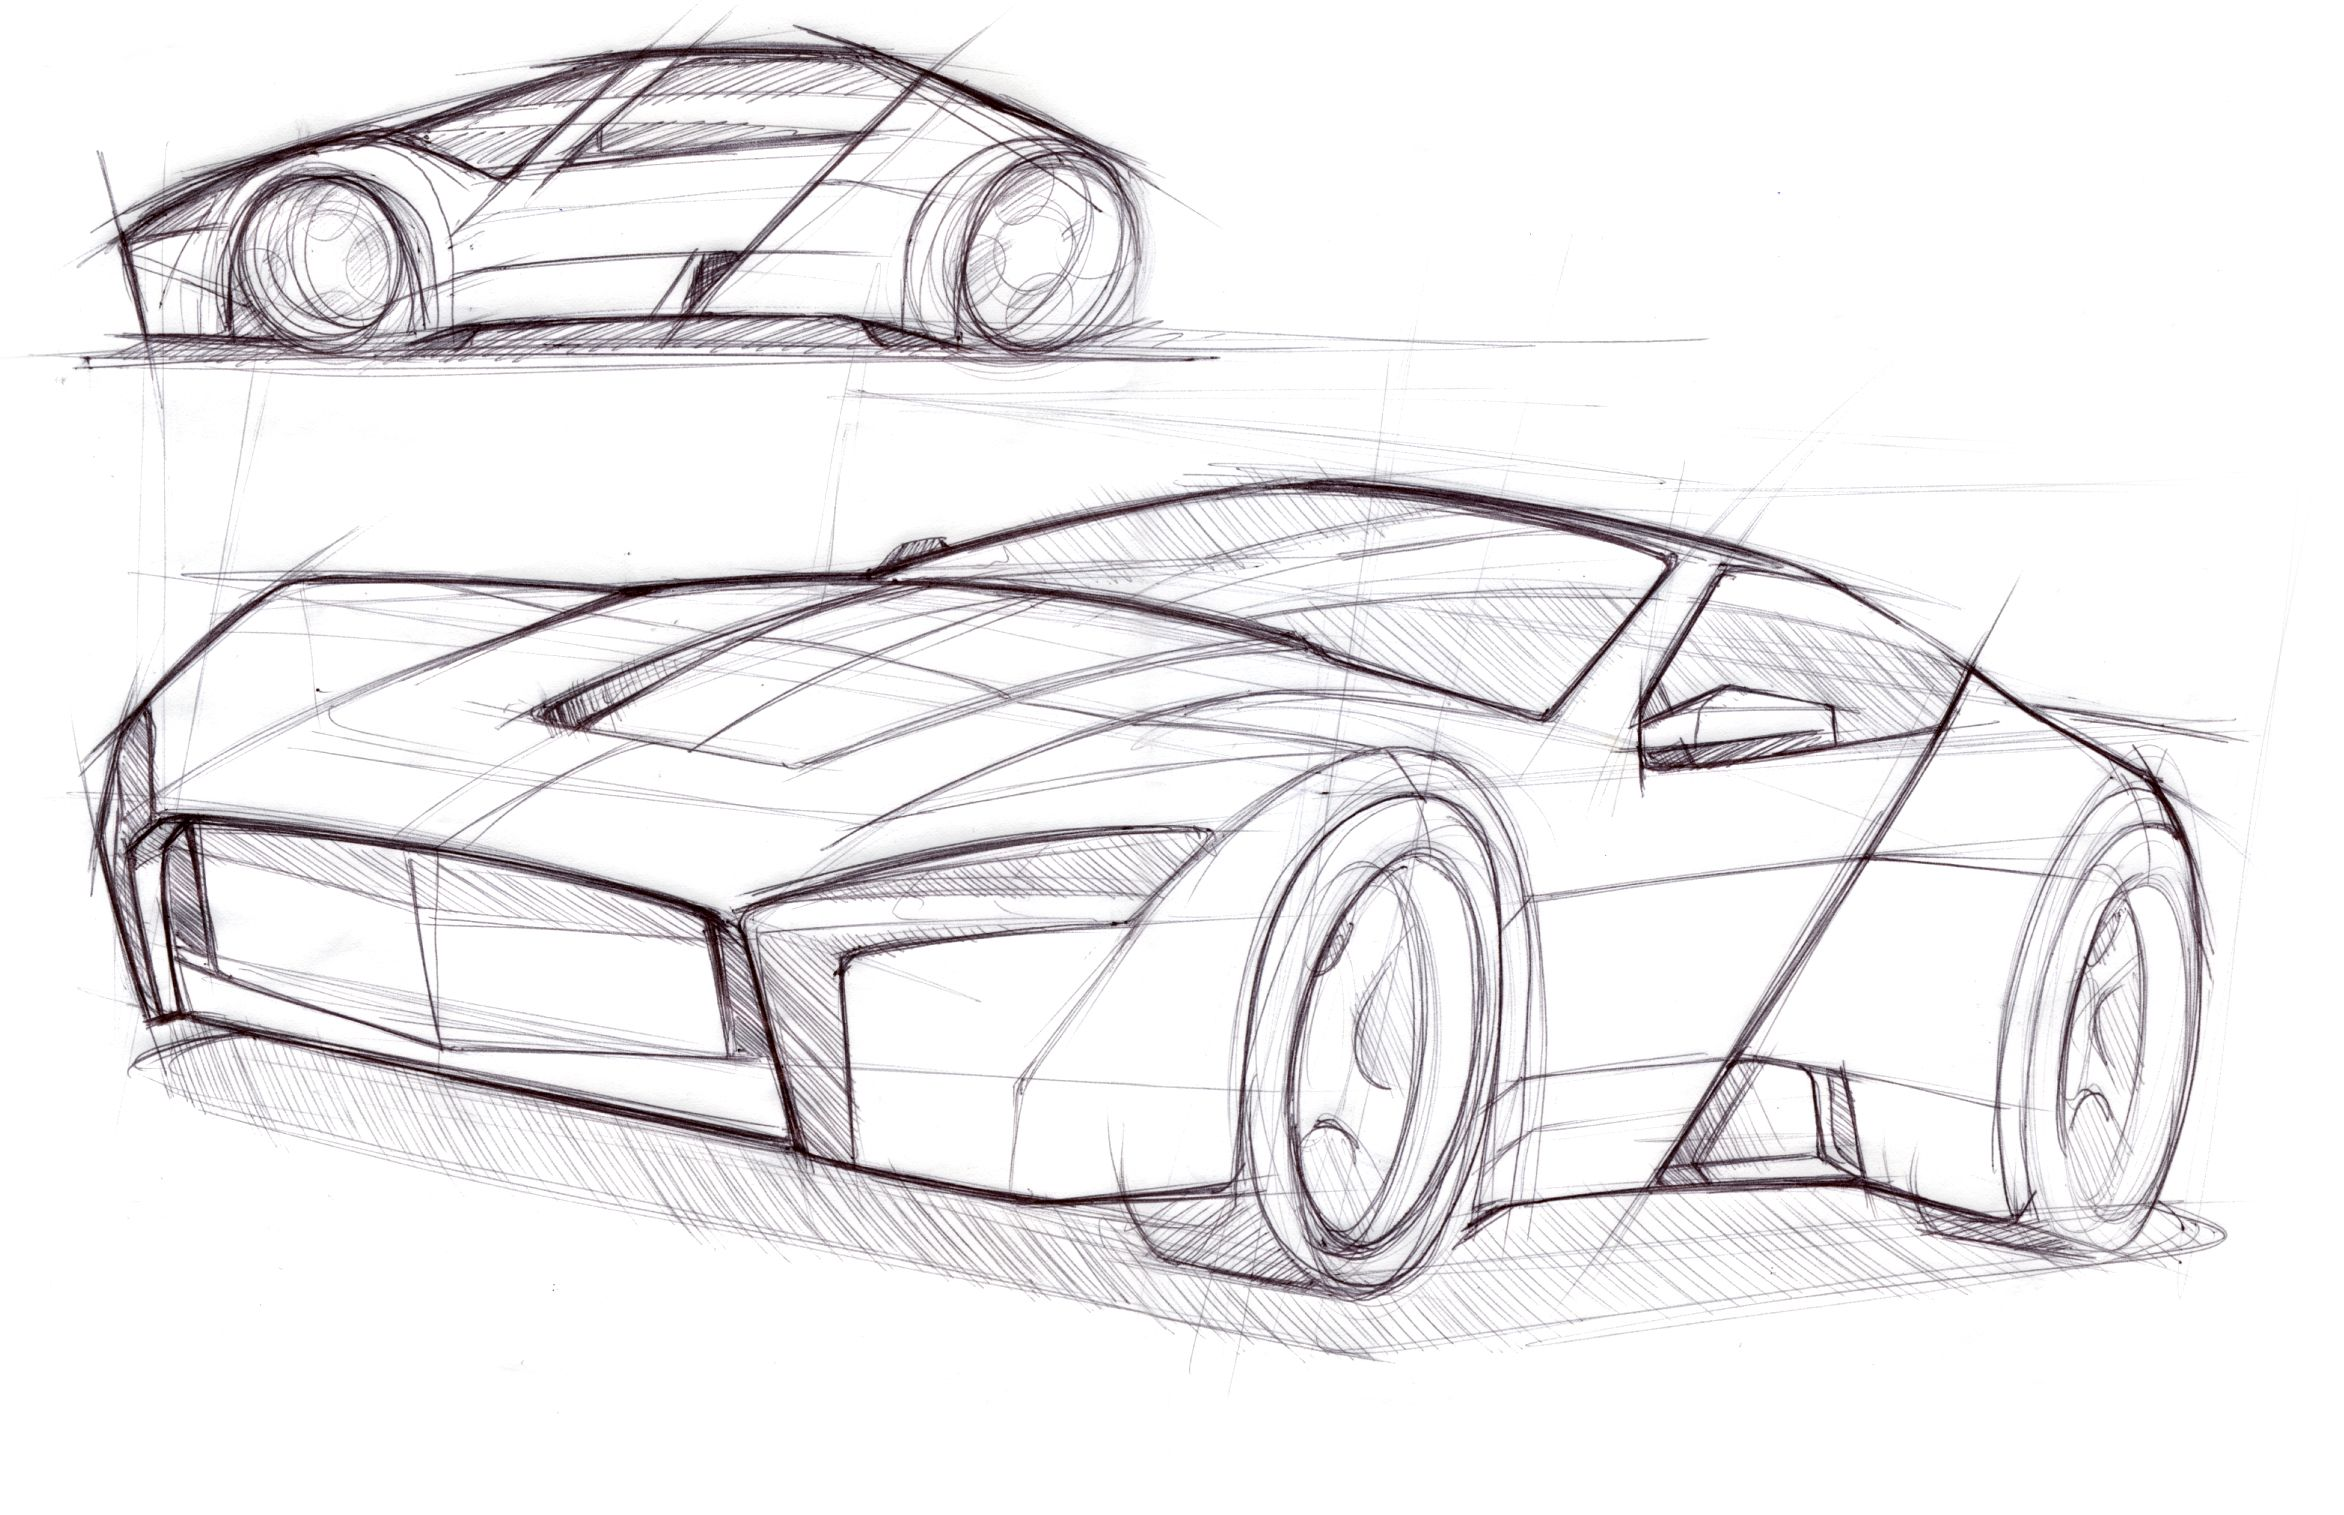 Basic design of a car - Sketch Design